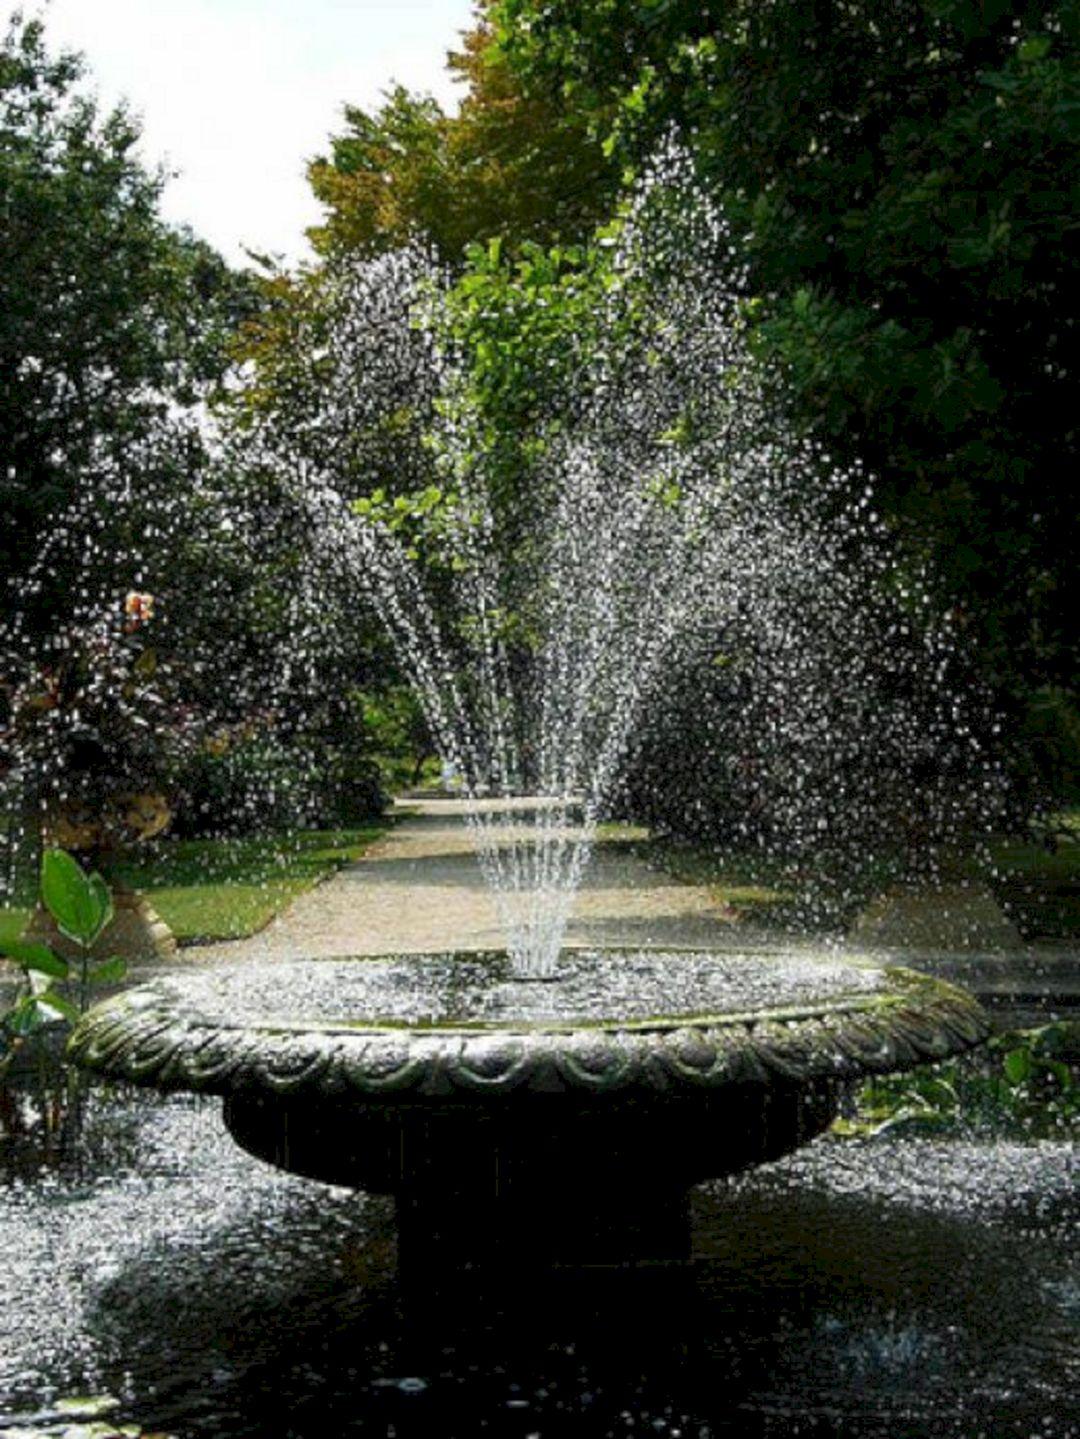 Garden Water Fountains Outdoors (Garden Water Fountains ... on Home Garden Fountain Design id=37454